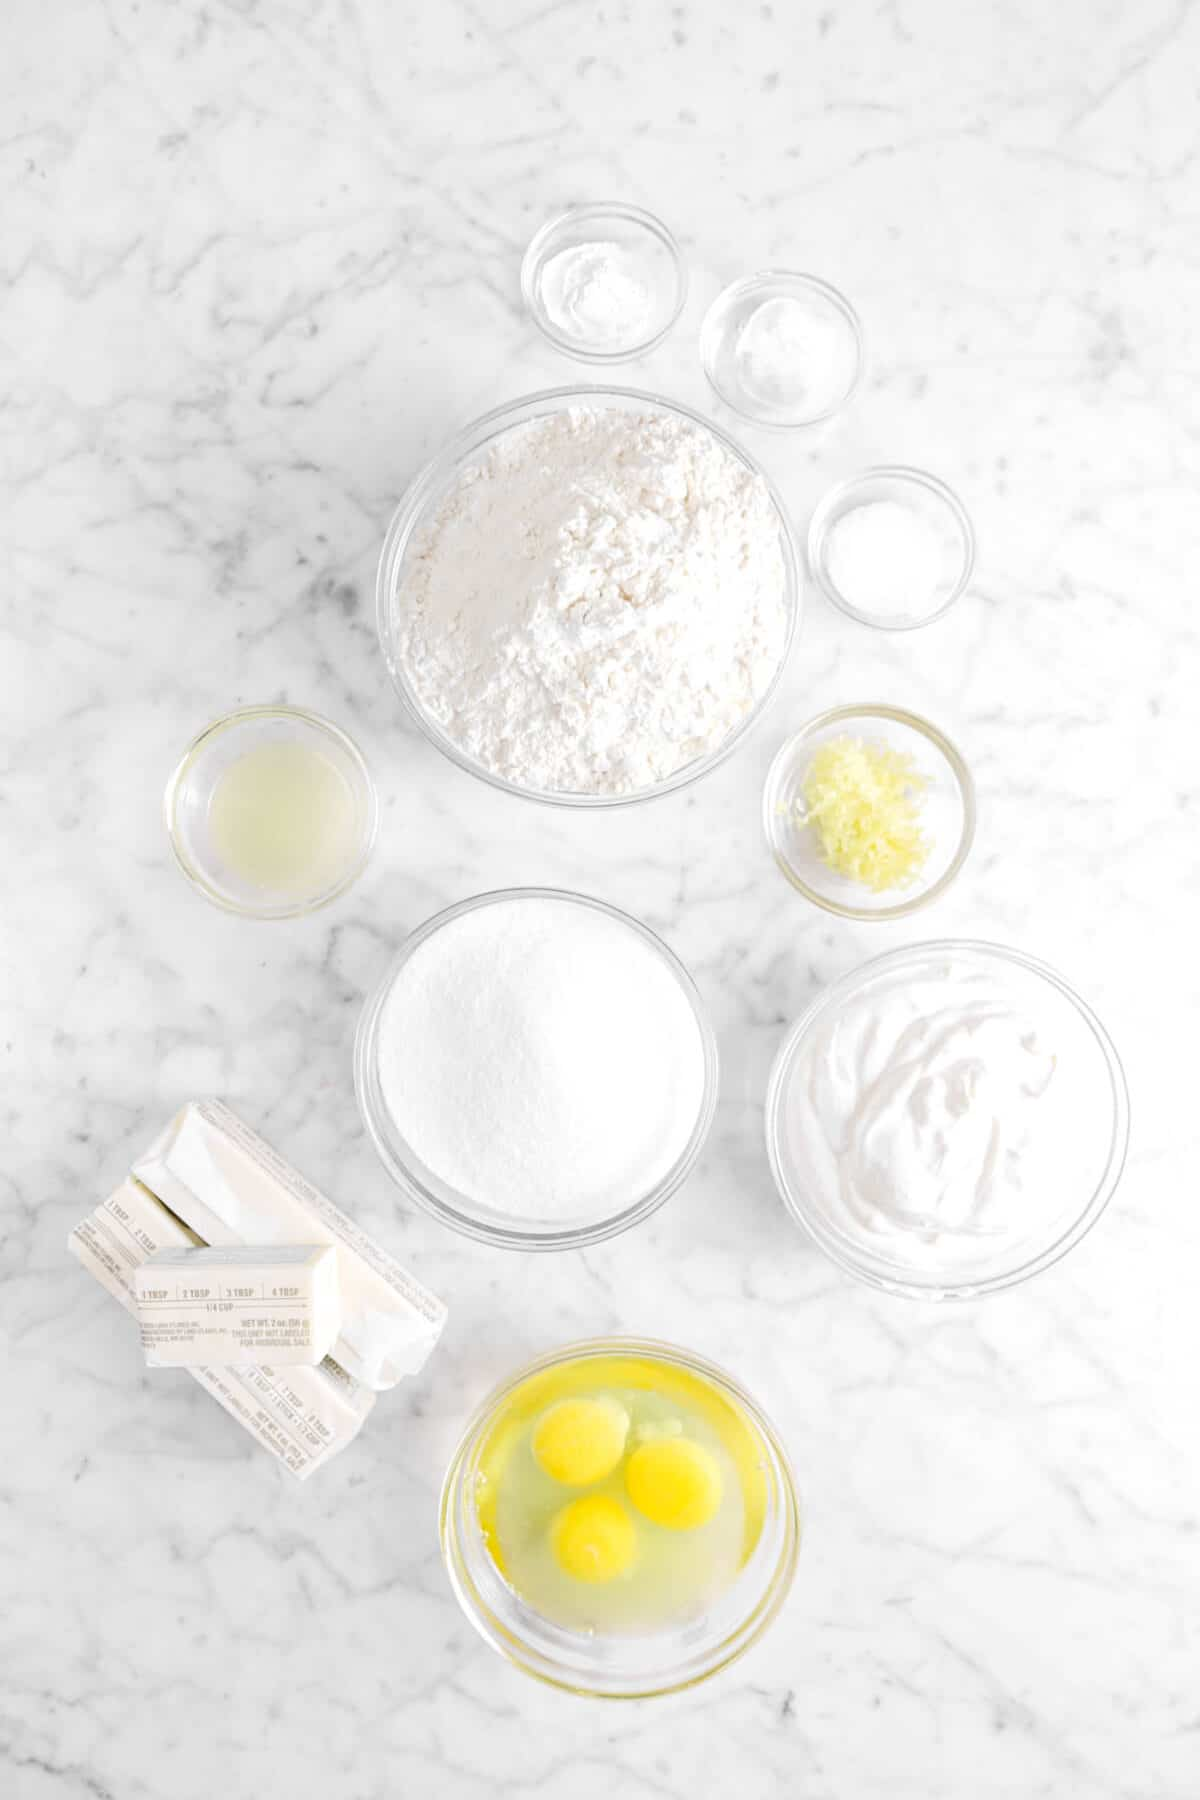 baking powder, salt, baking soda, flour, lemon zest, lemon juice, sour cream, sugar, butter and eggs on marble counter